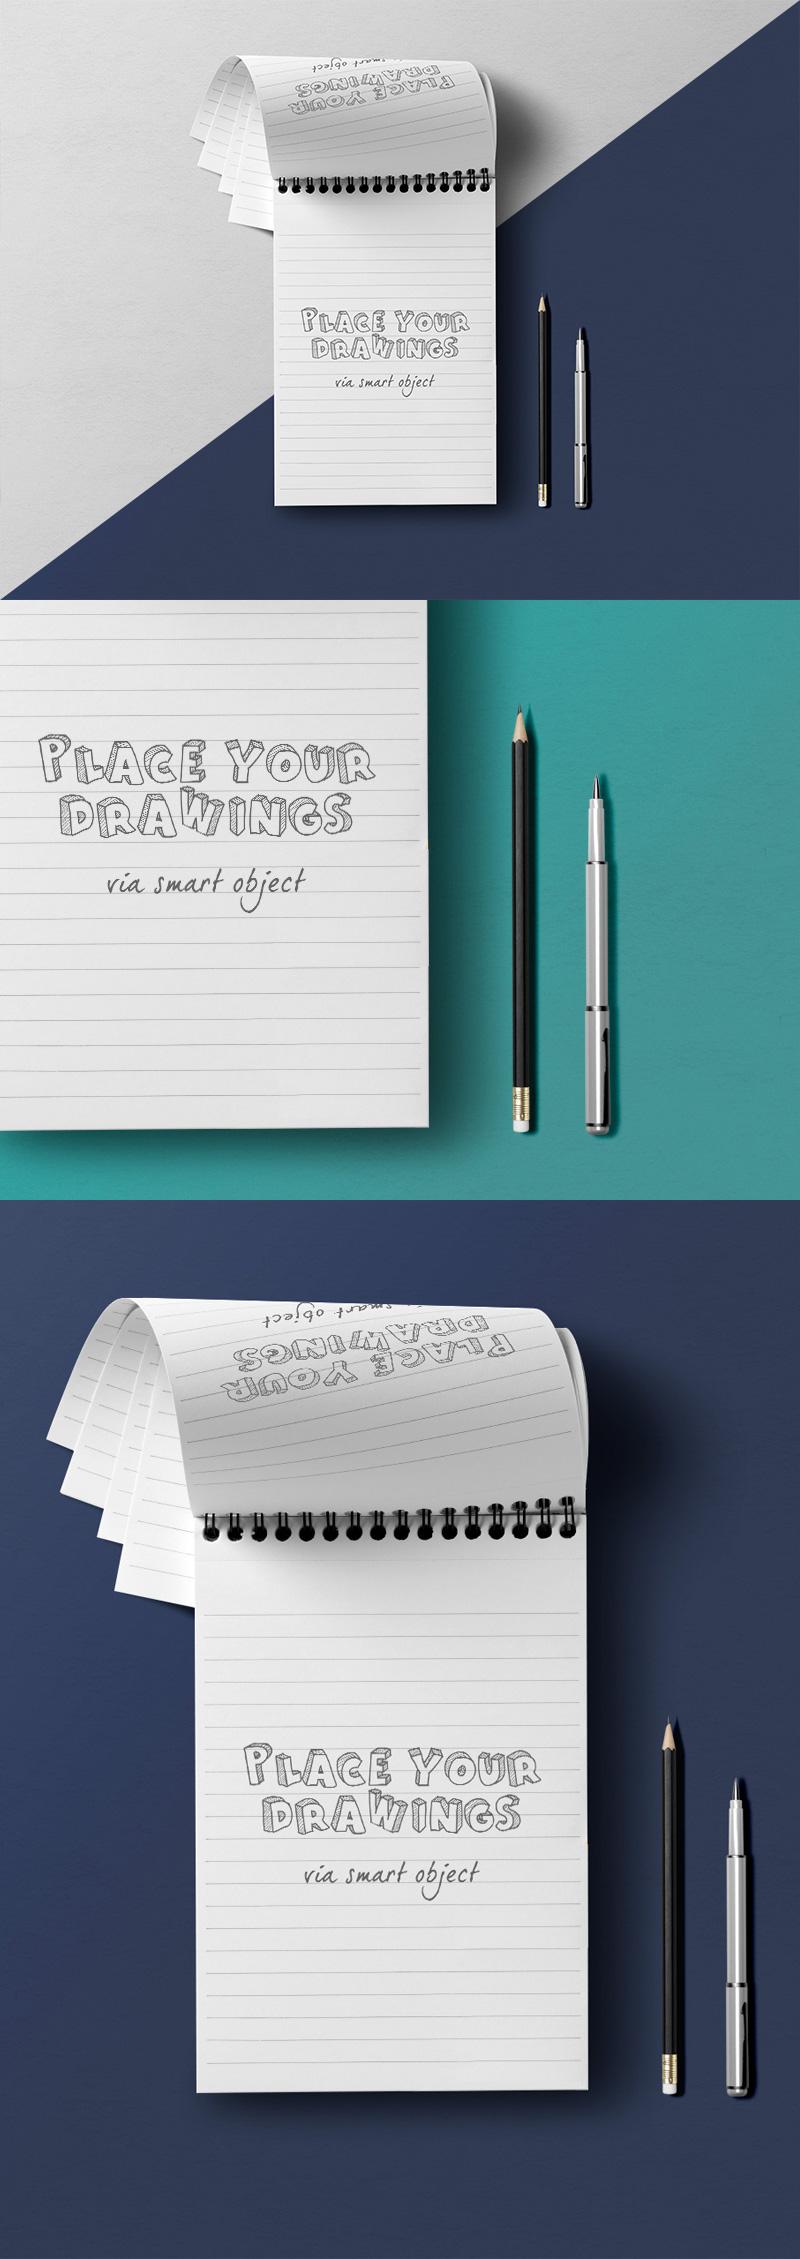 notepad overhead view mockup